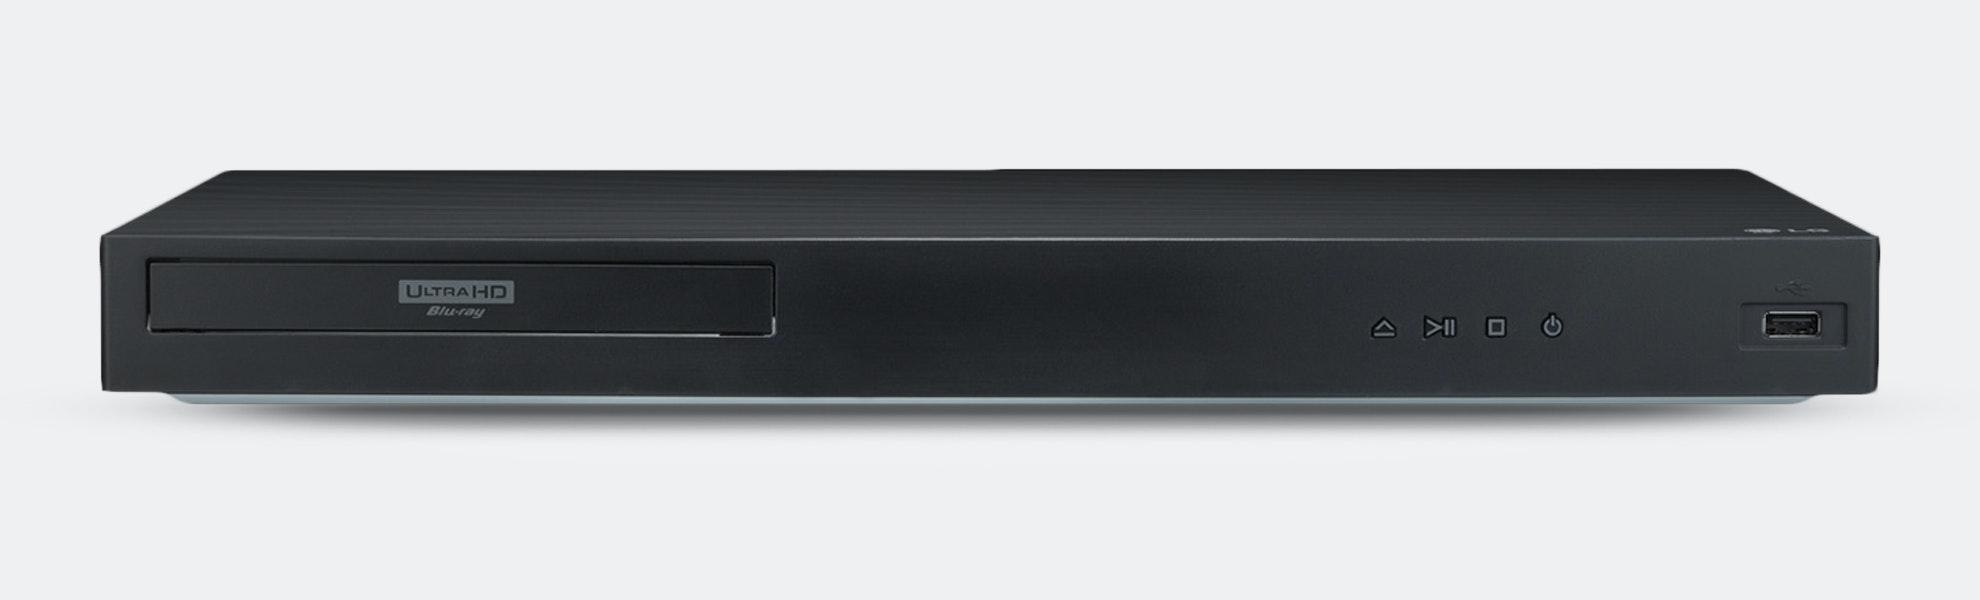 LG UBK90 4K Ultra HDR Dolby Vision Blu-Ray Player